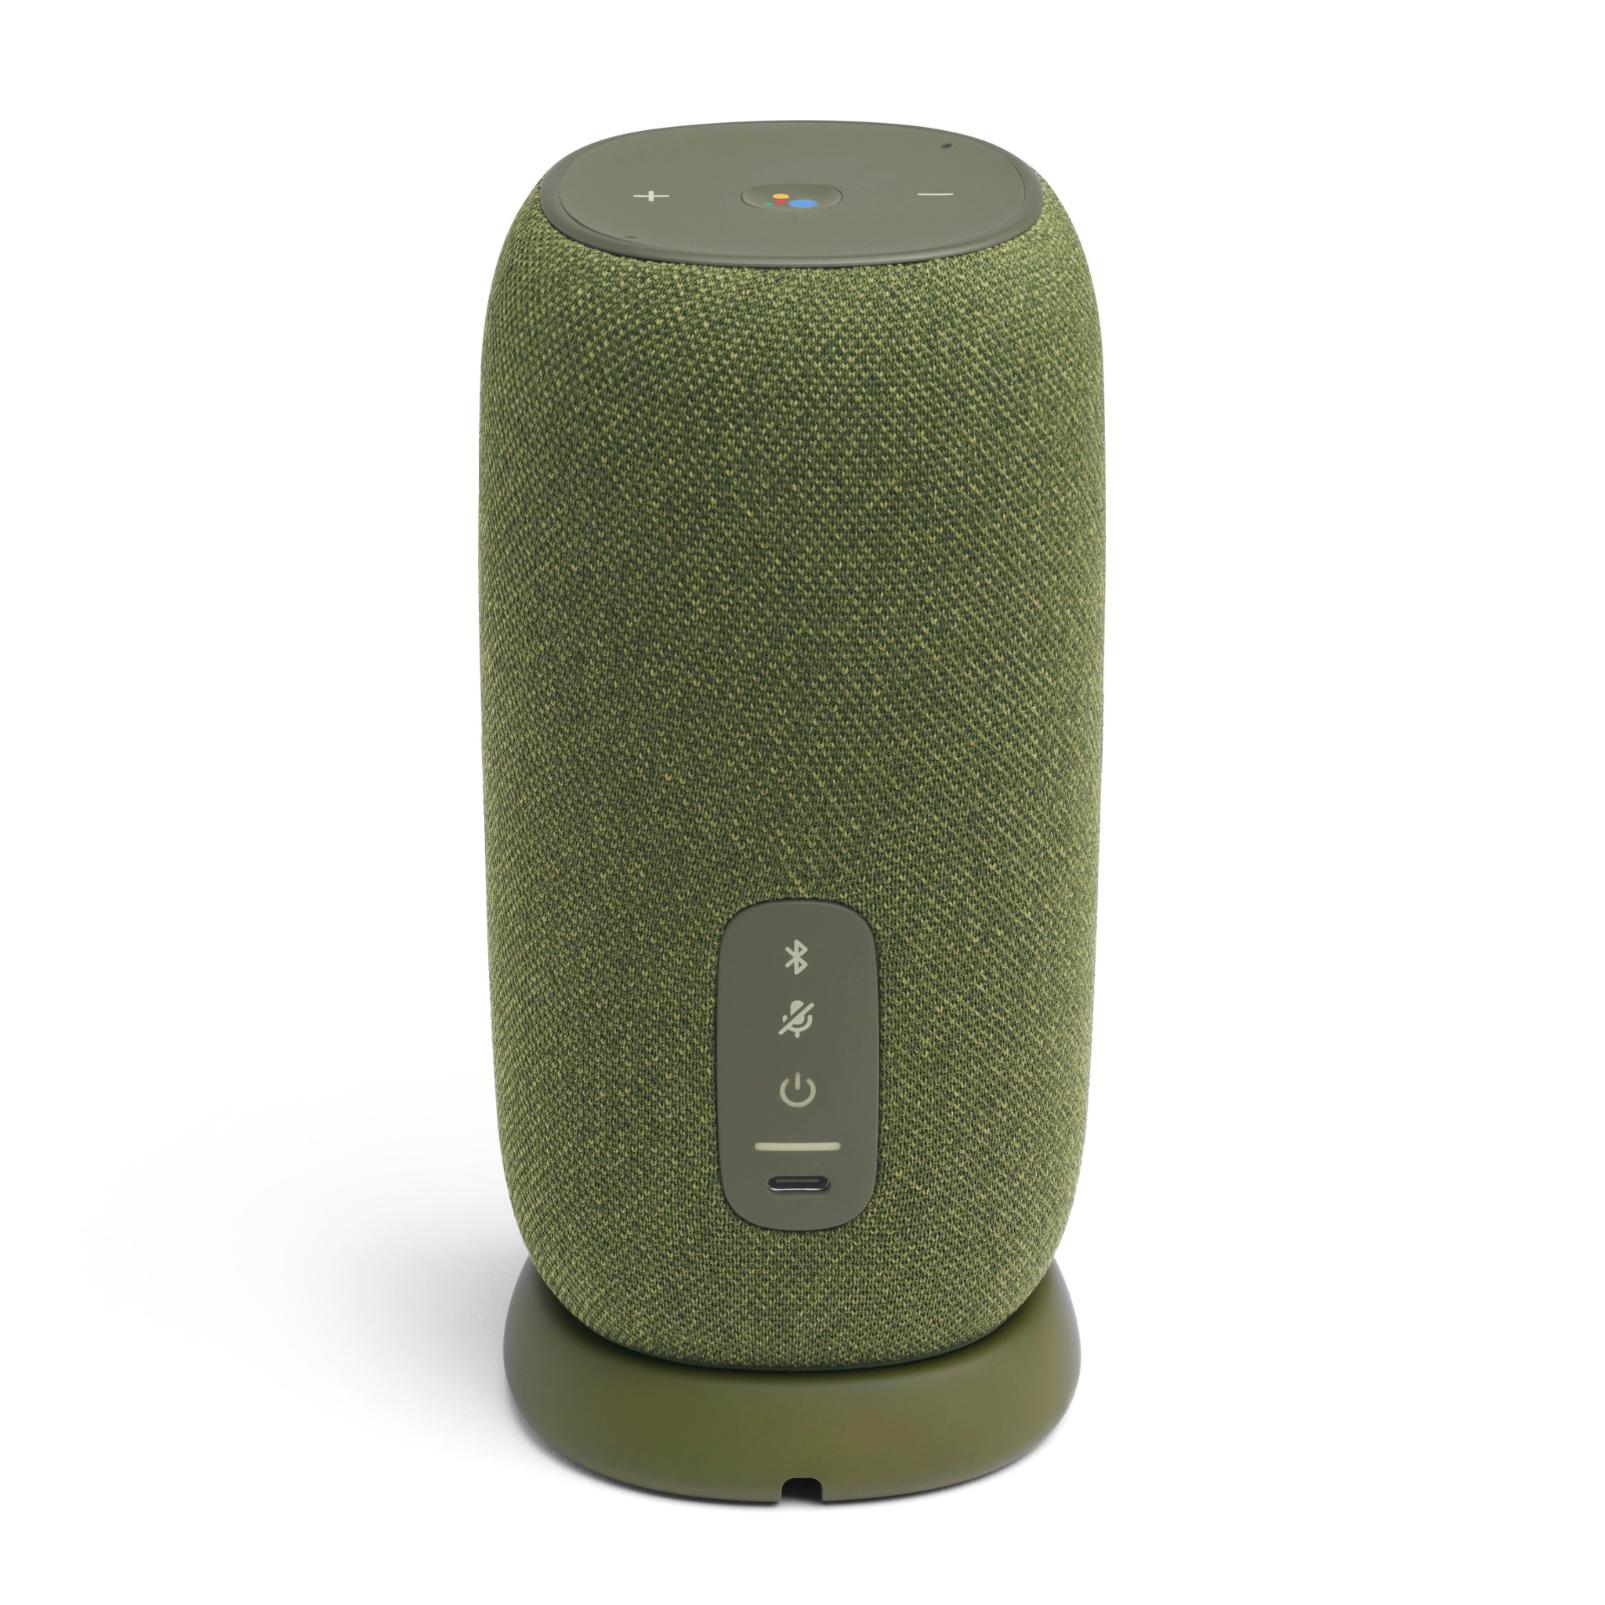 JBL Link Portable - Green - Portable Wi-Fi Speaker - Back